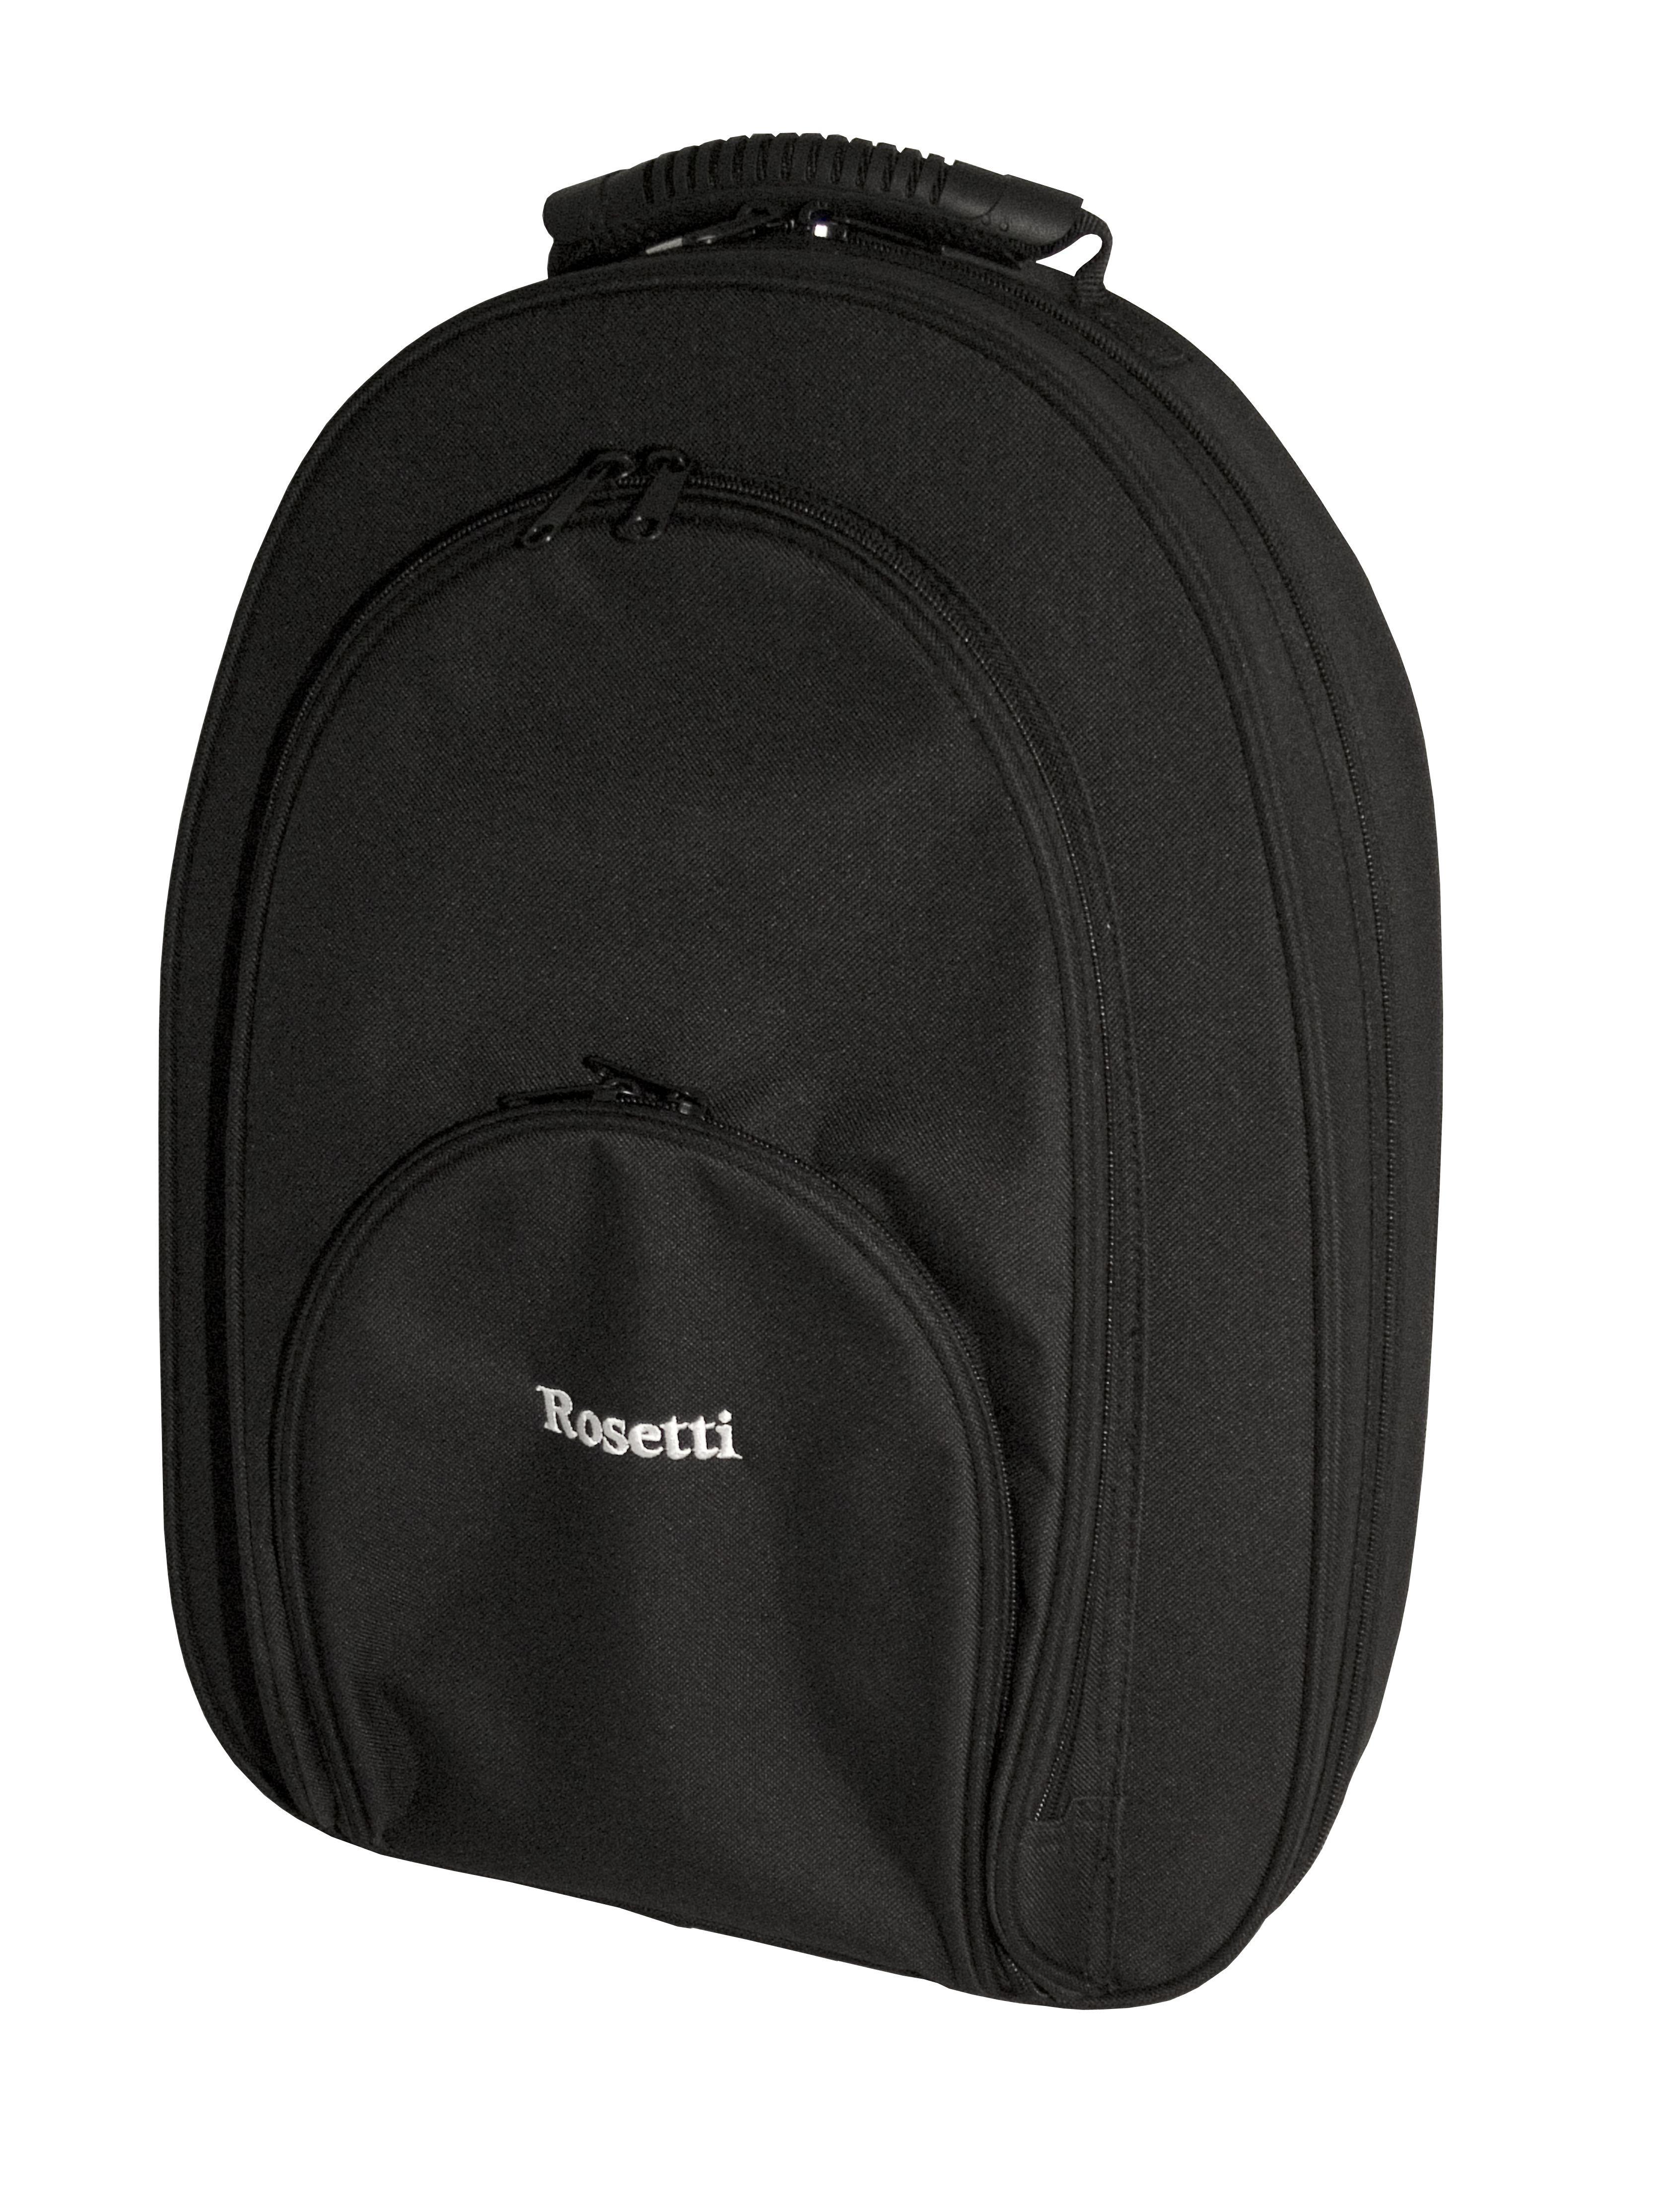 Rosetti Double Clarinet Bag